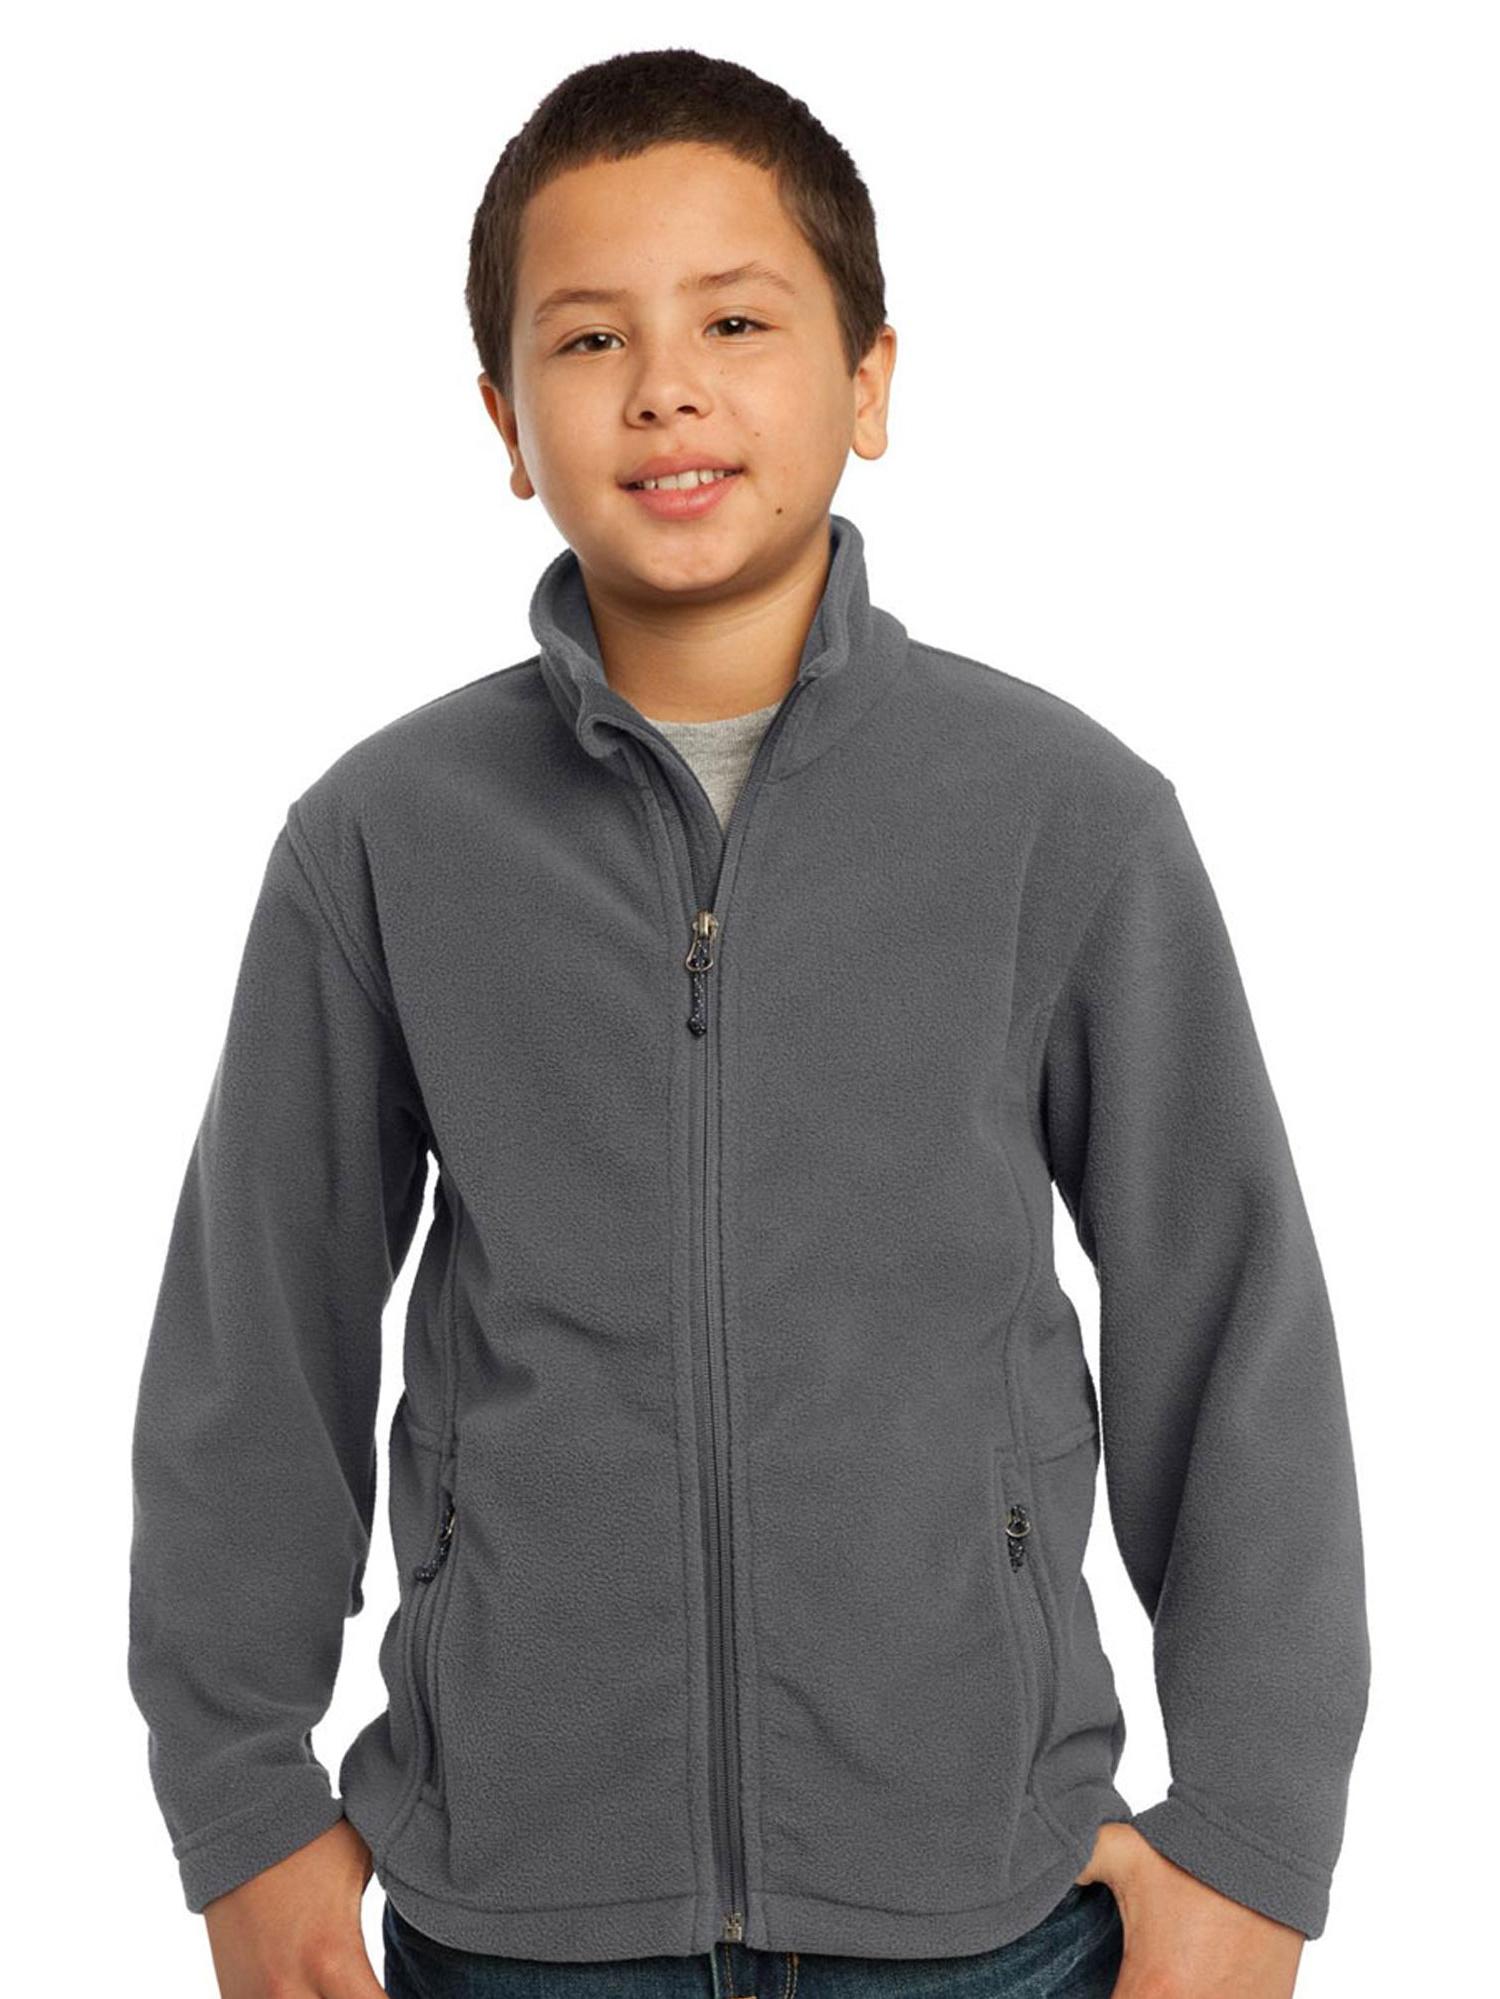 Port Authority Youth Pocket Zipper Soft Fleece Jacket